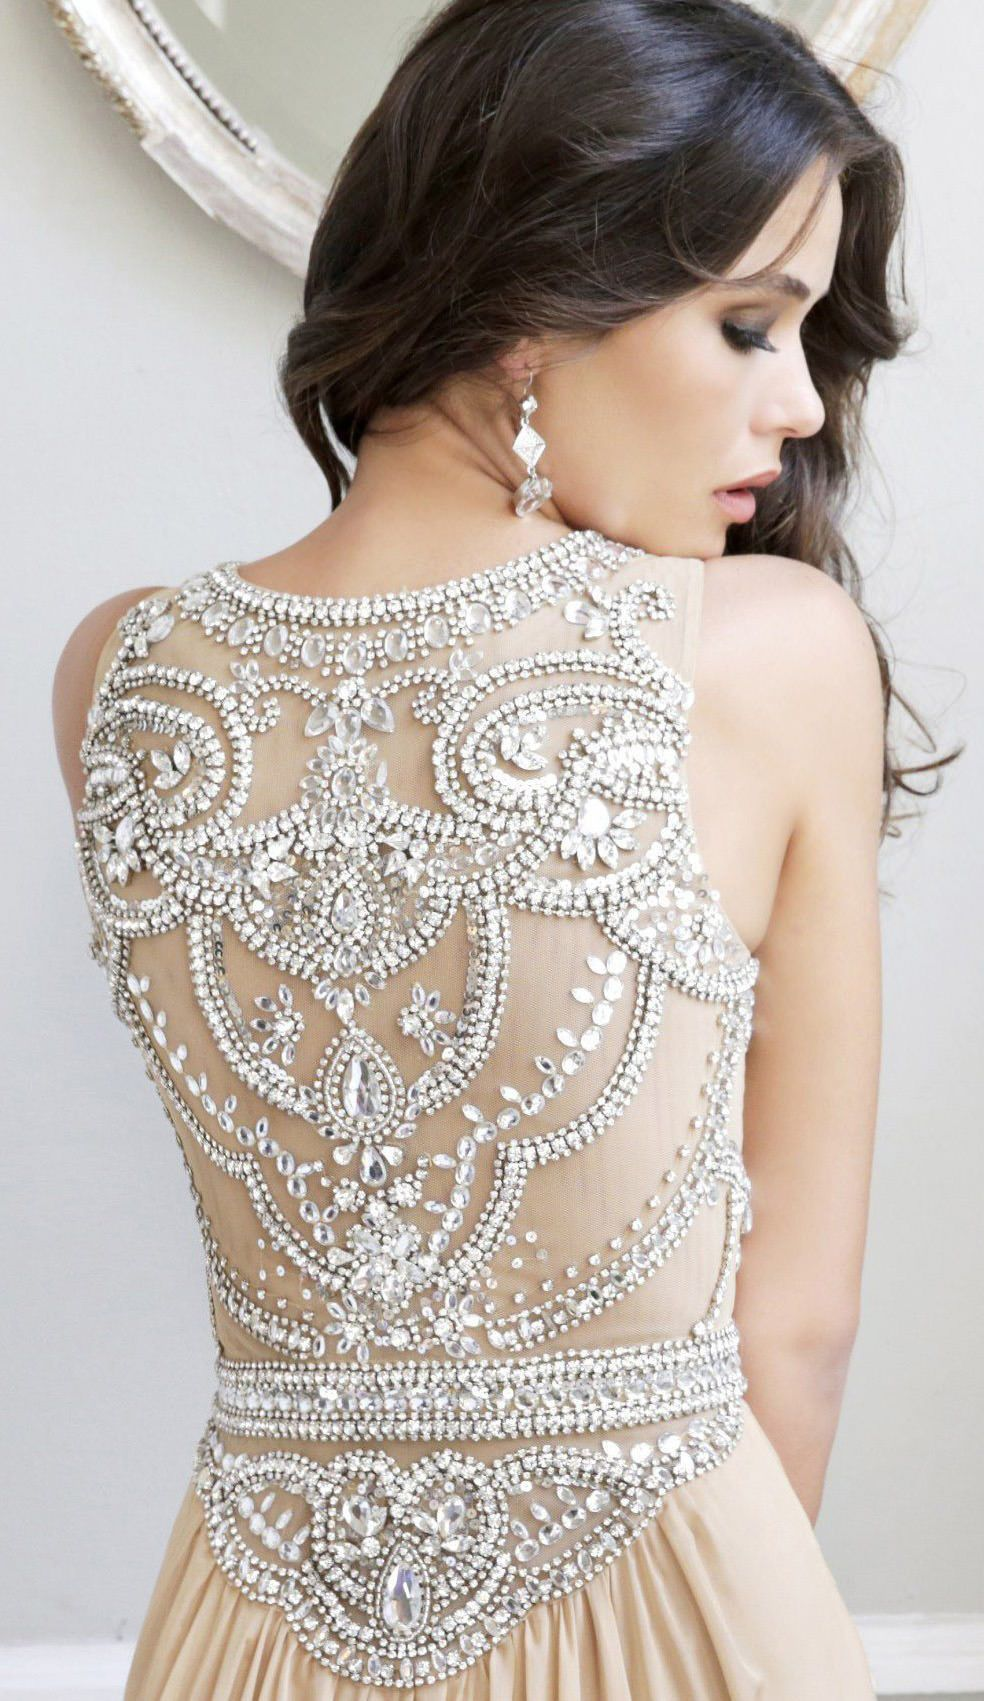 Sherri Hill Is My Prom Dress Hero I Love Her Designs 11069 Sheer Low Back